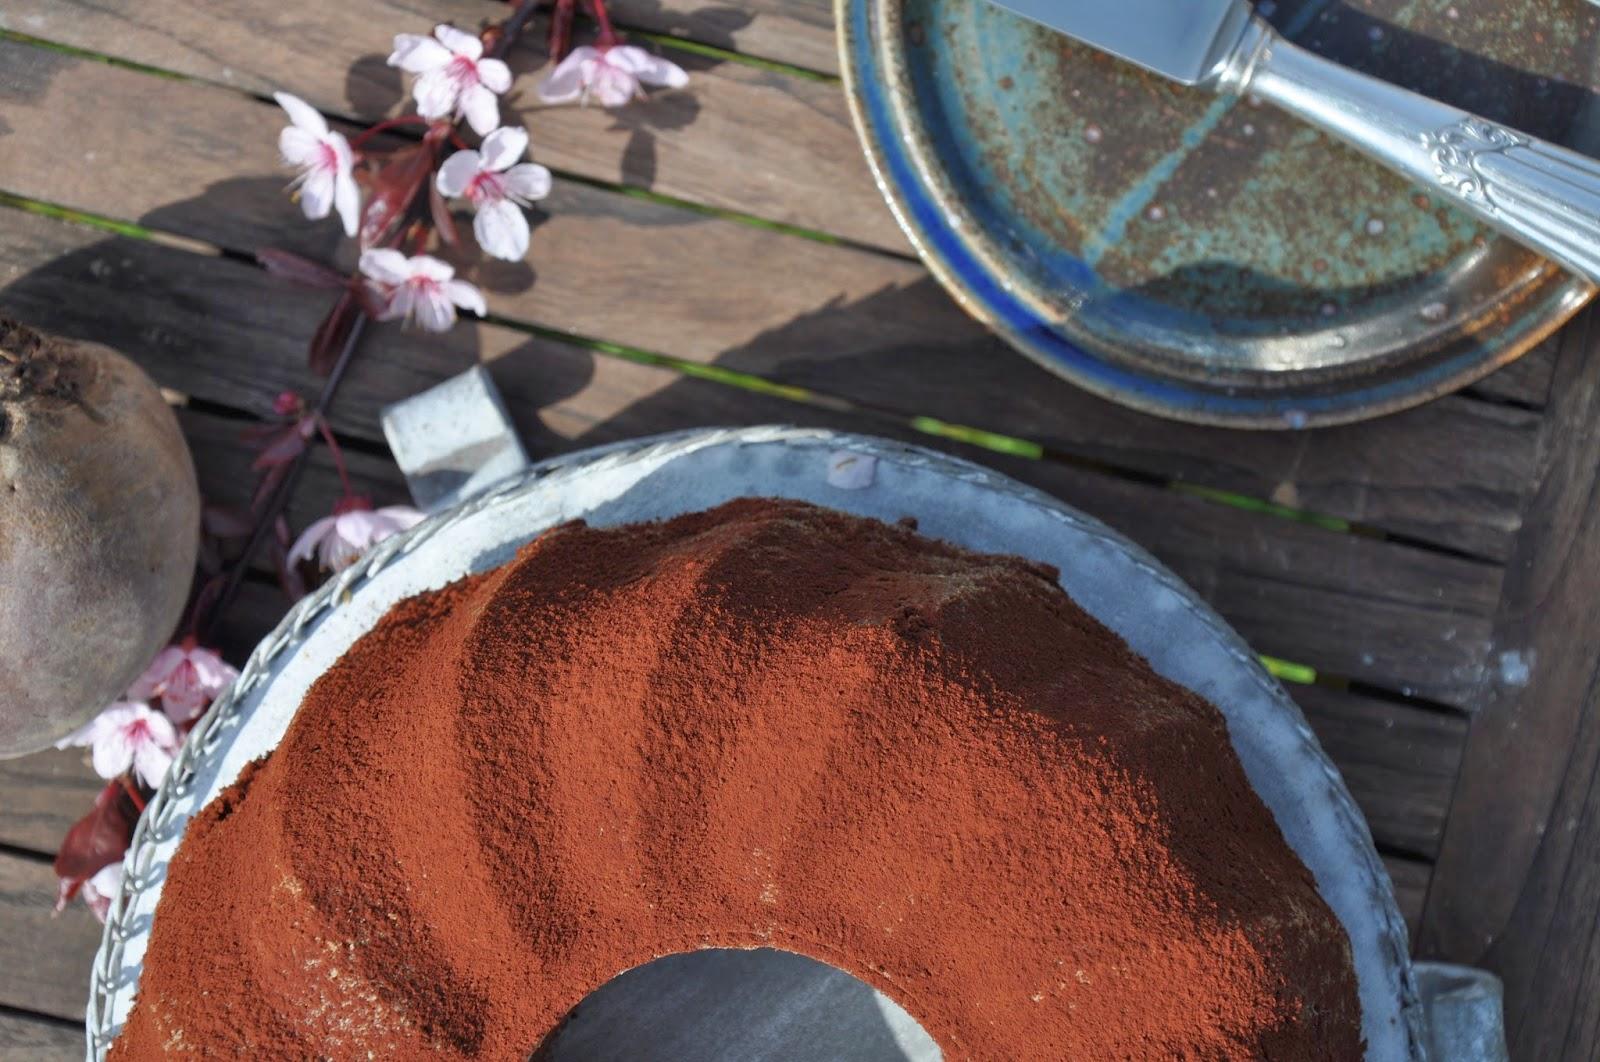 kr melkreationen schoko guglhupf mit roter beete und oliven l. Black Bedroom Furniture Sets. Home Design Ideas